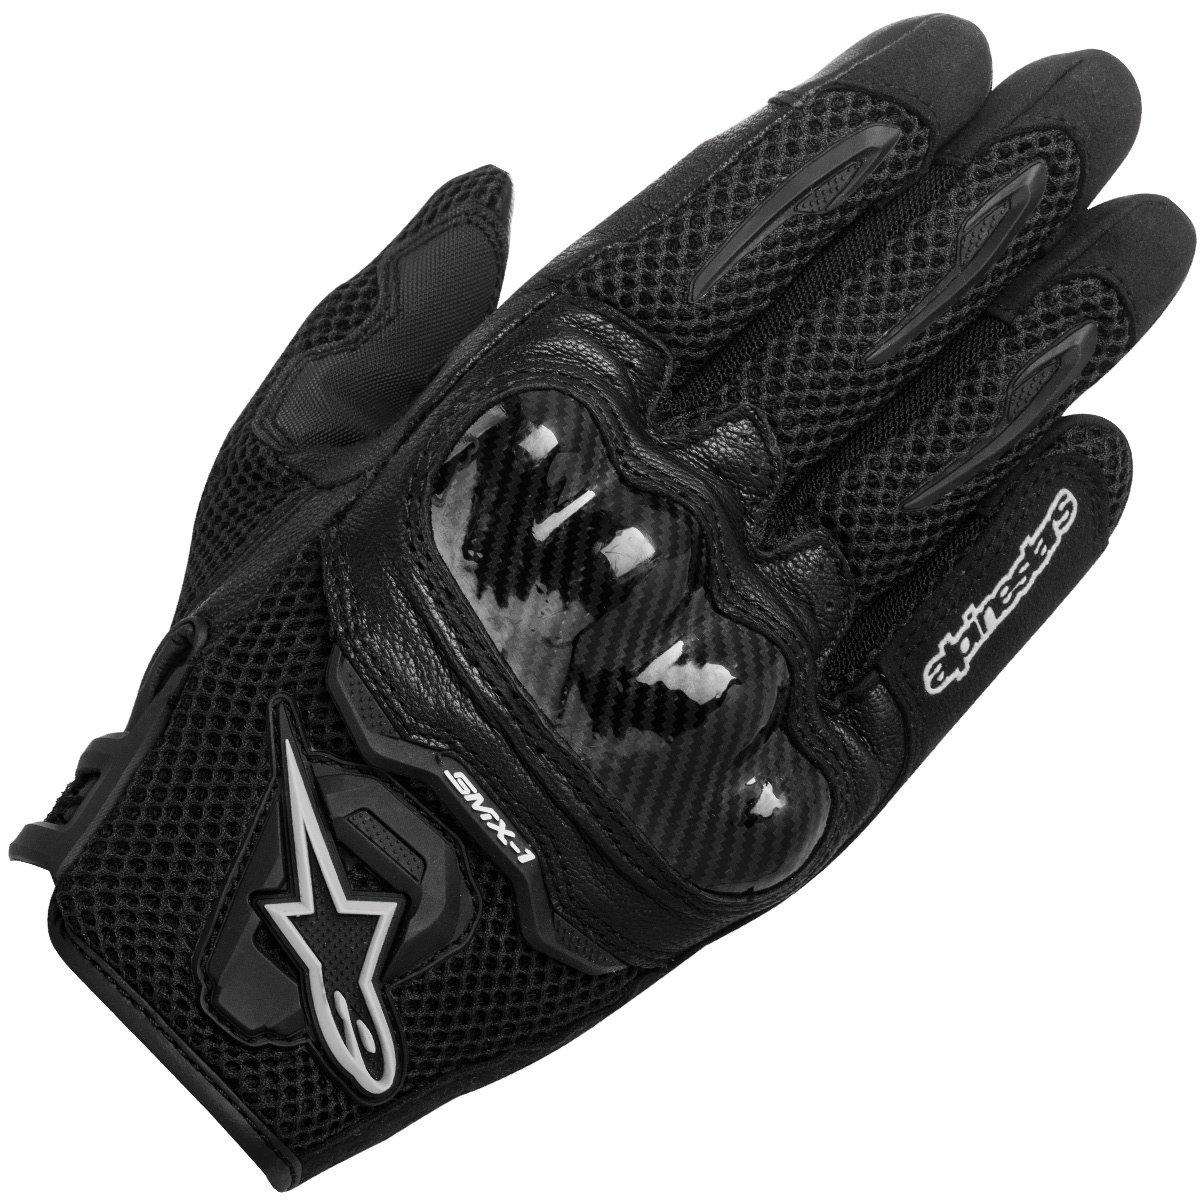 Alpinestars SMX-1 Air Women's Street Motorcycle Gloves - Black/Small